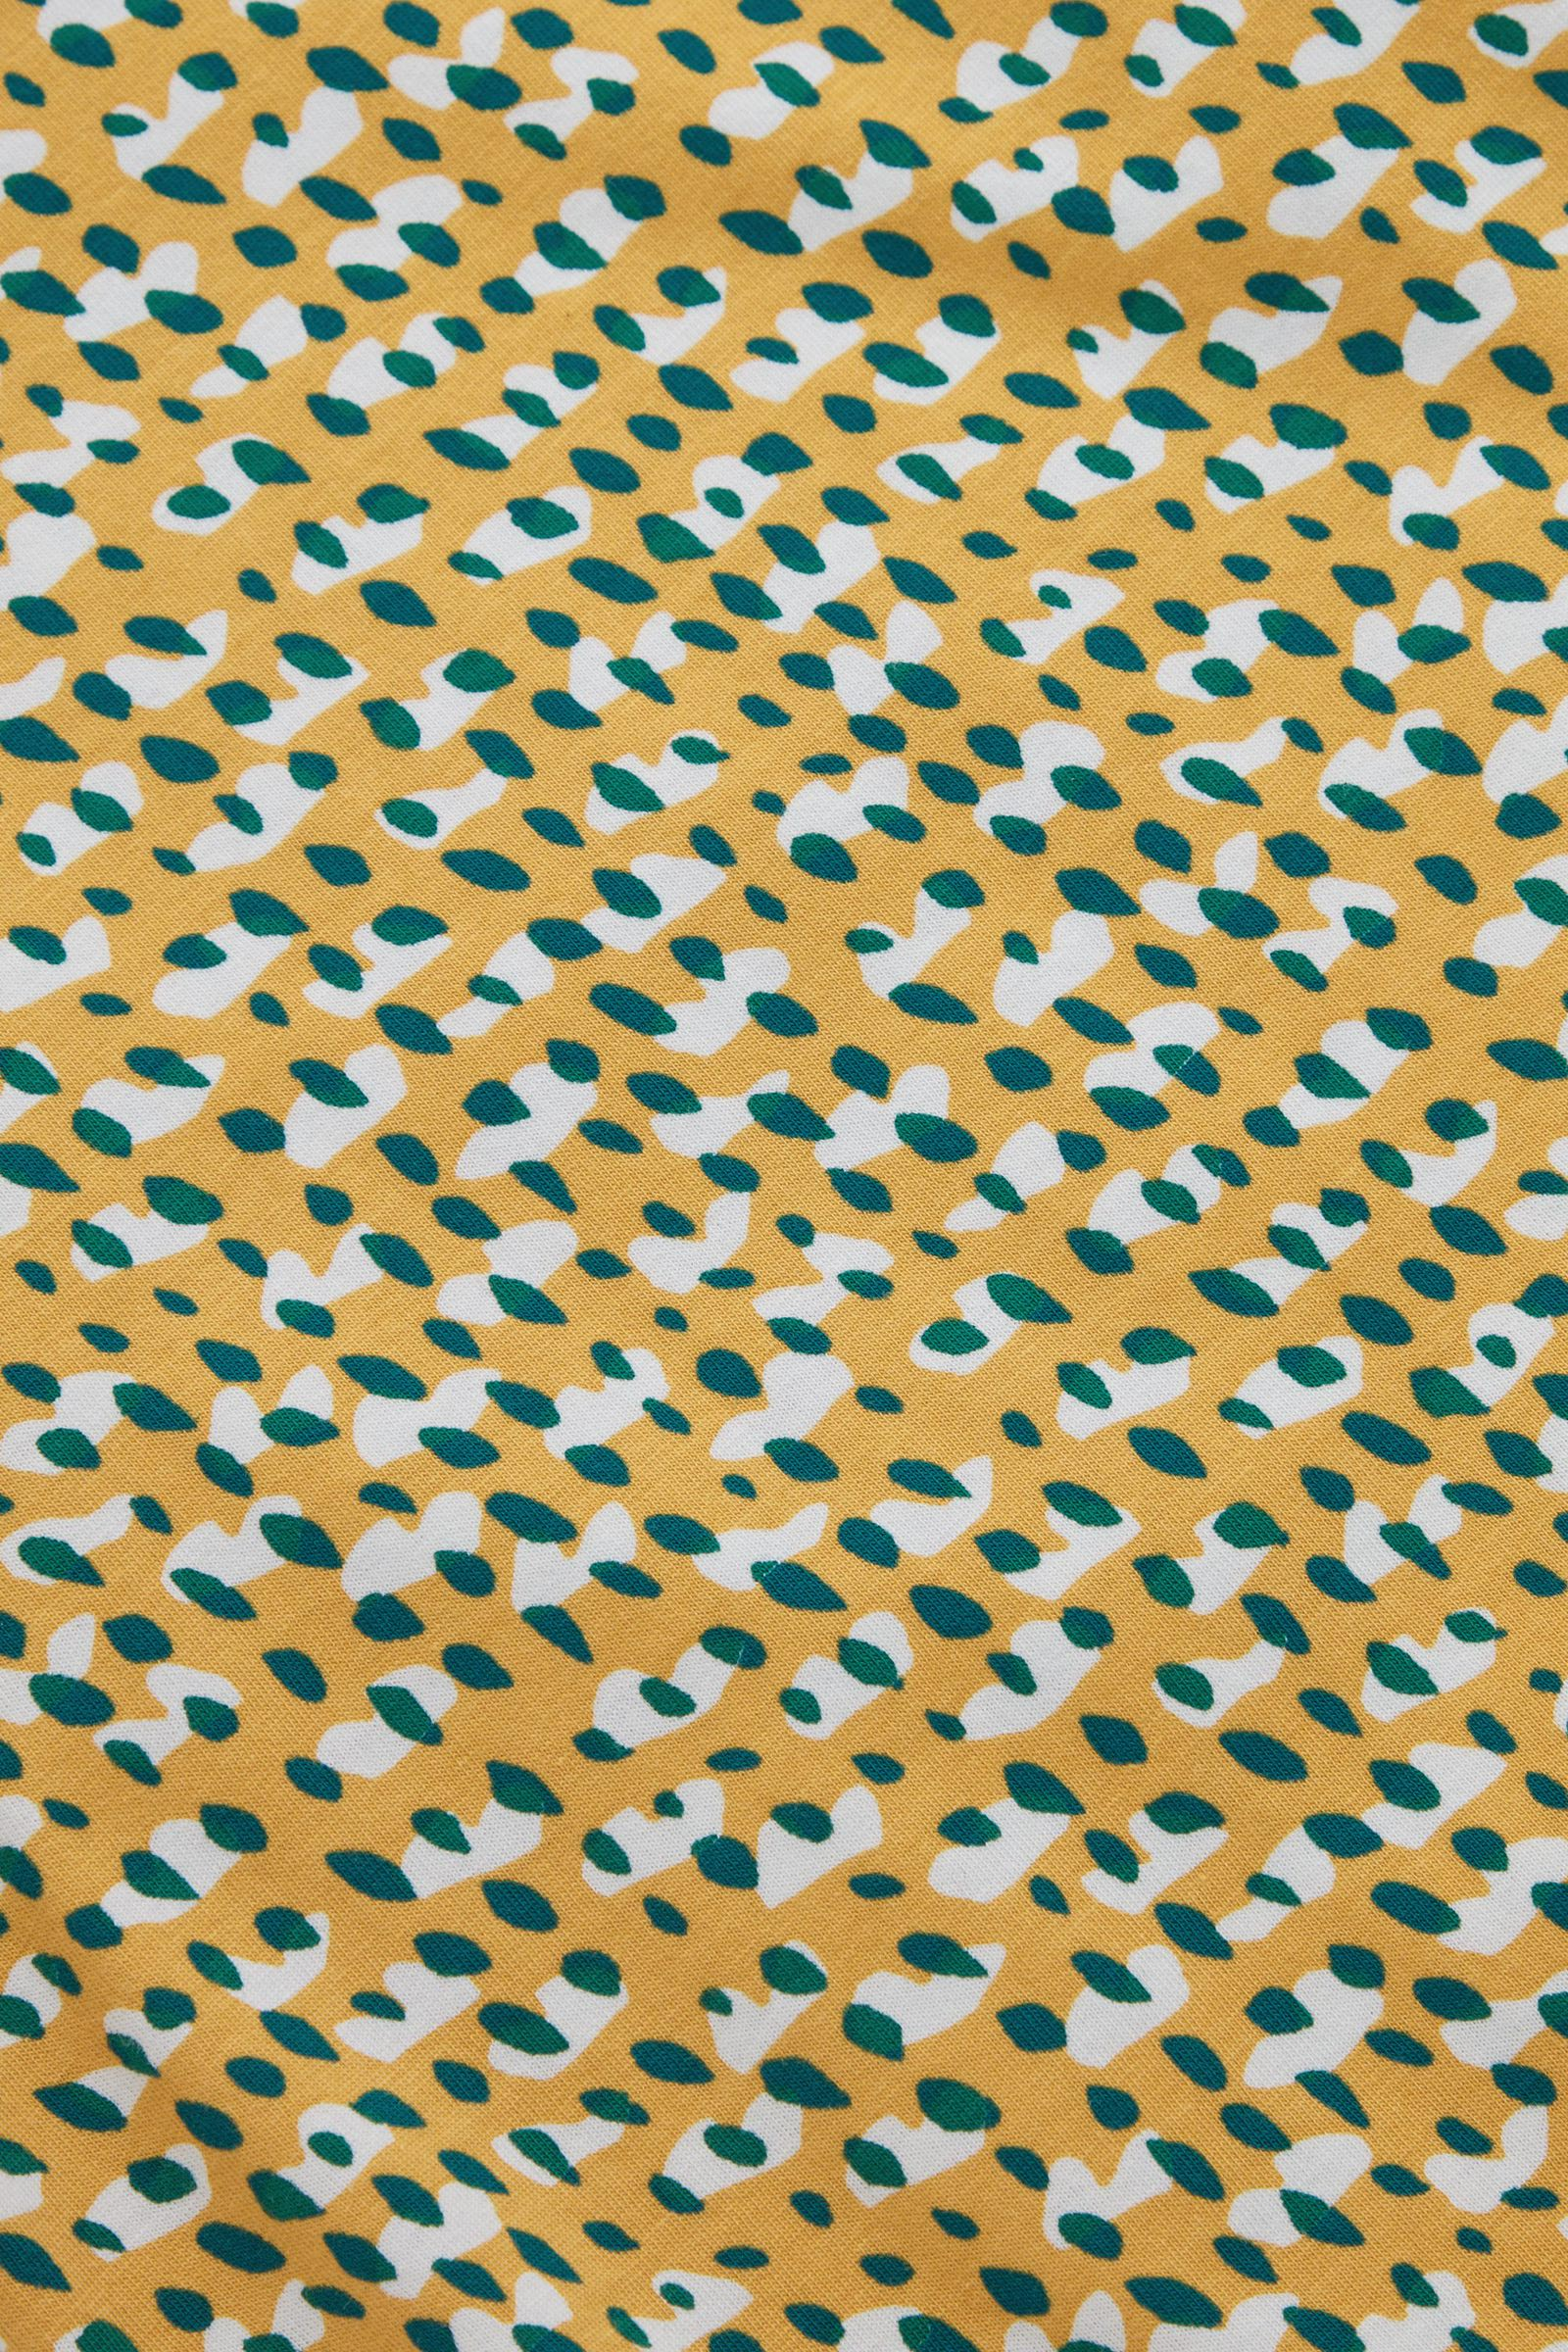 COS 프린티드 오가닉 코튼 티셔츠의 옐로우 / 그린 / 화이트컬러 Detail입니다.